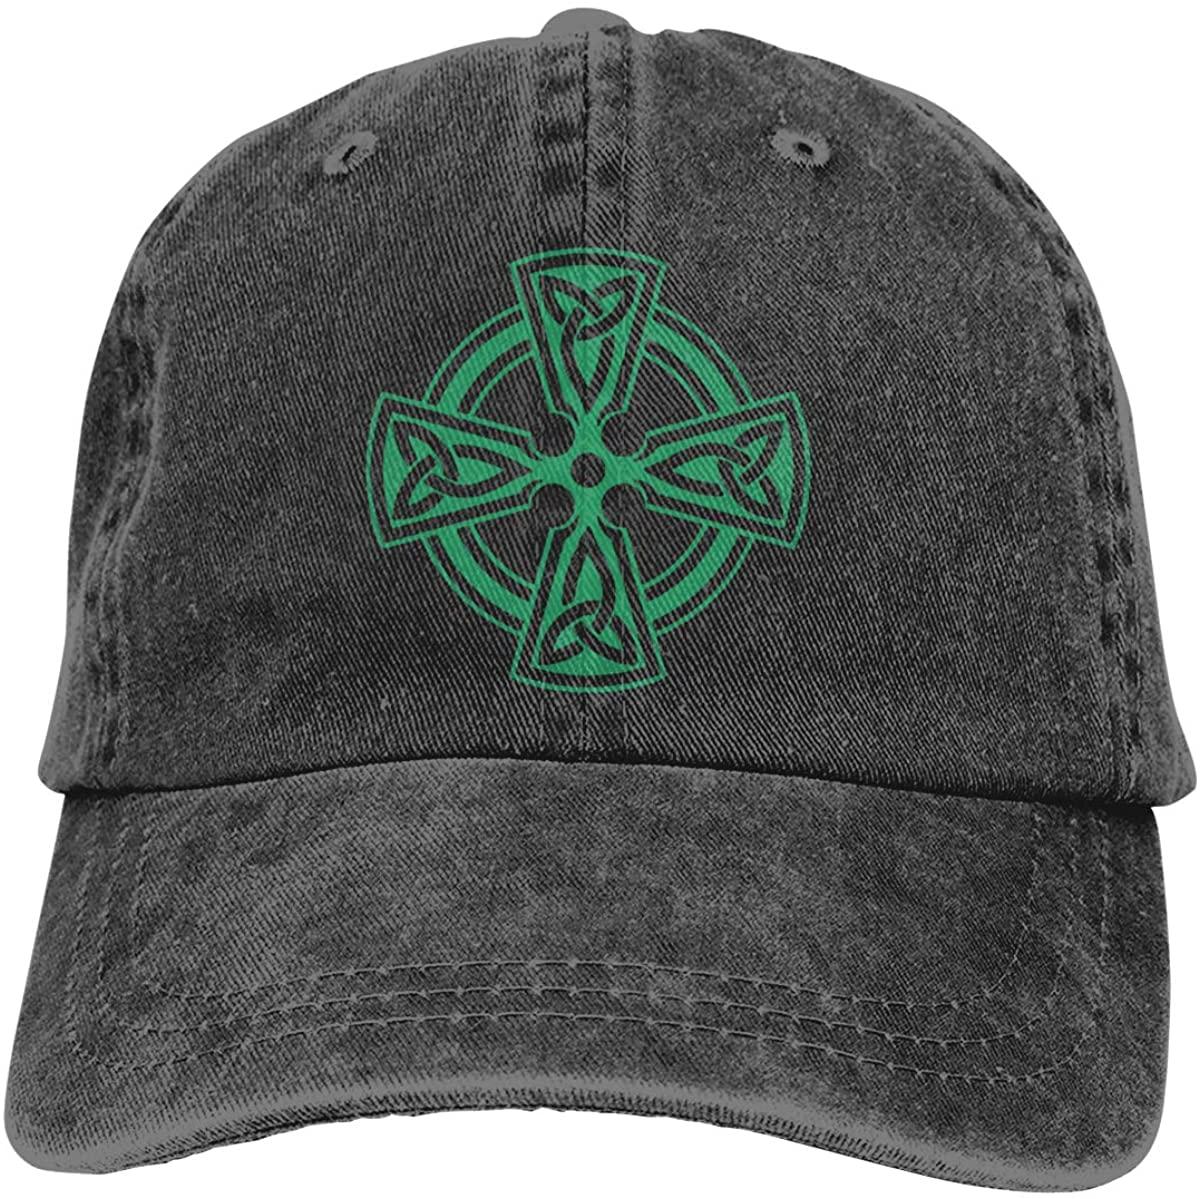 Celtic Cross Knot Irish Shield Warrior Unisex Classic American Style Printing Adjustable Denim Cowboy Hat